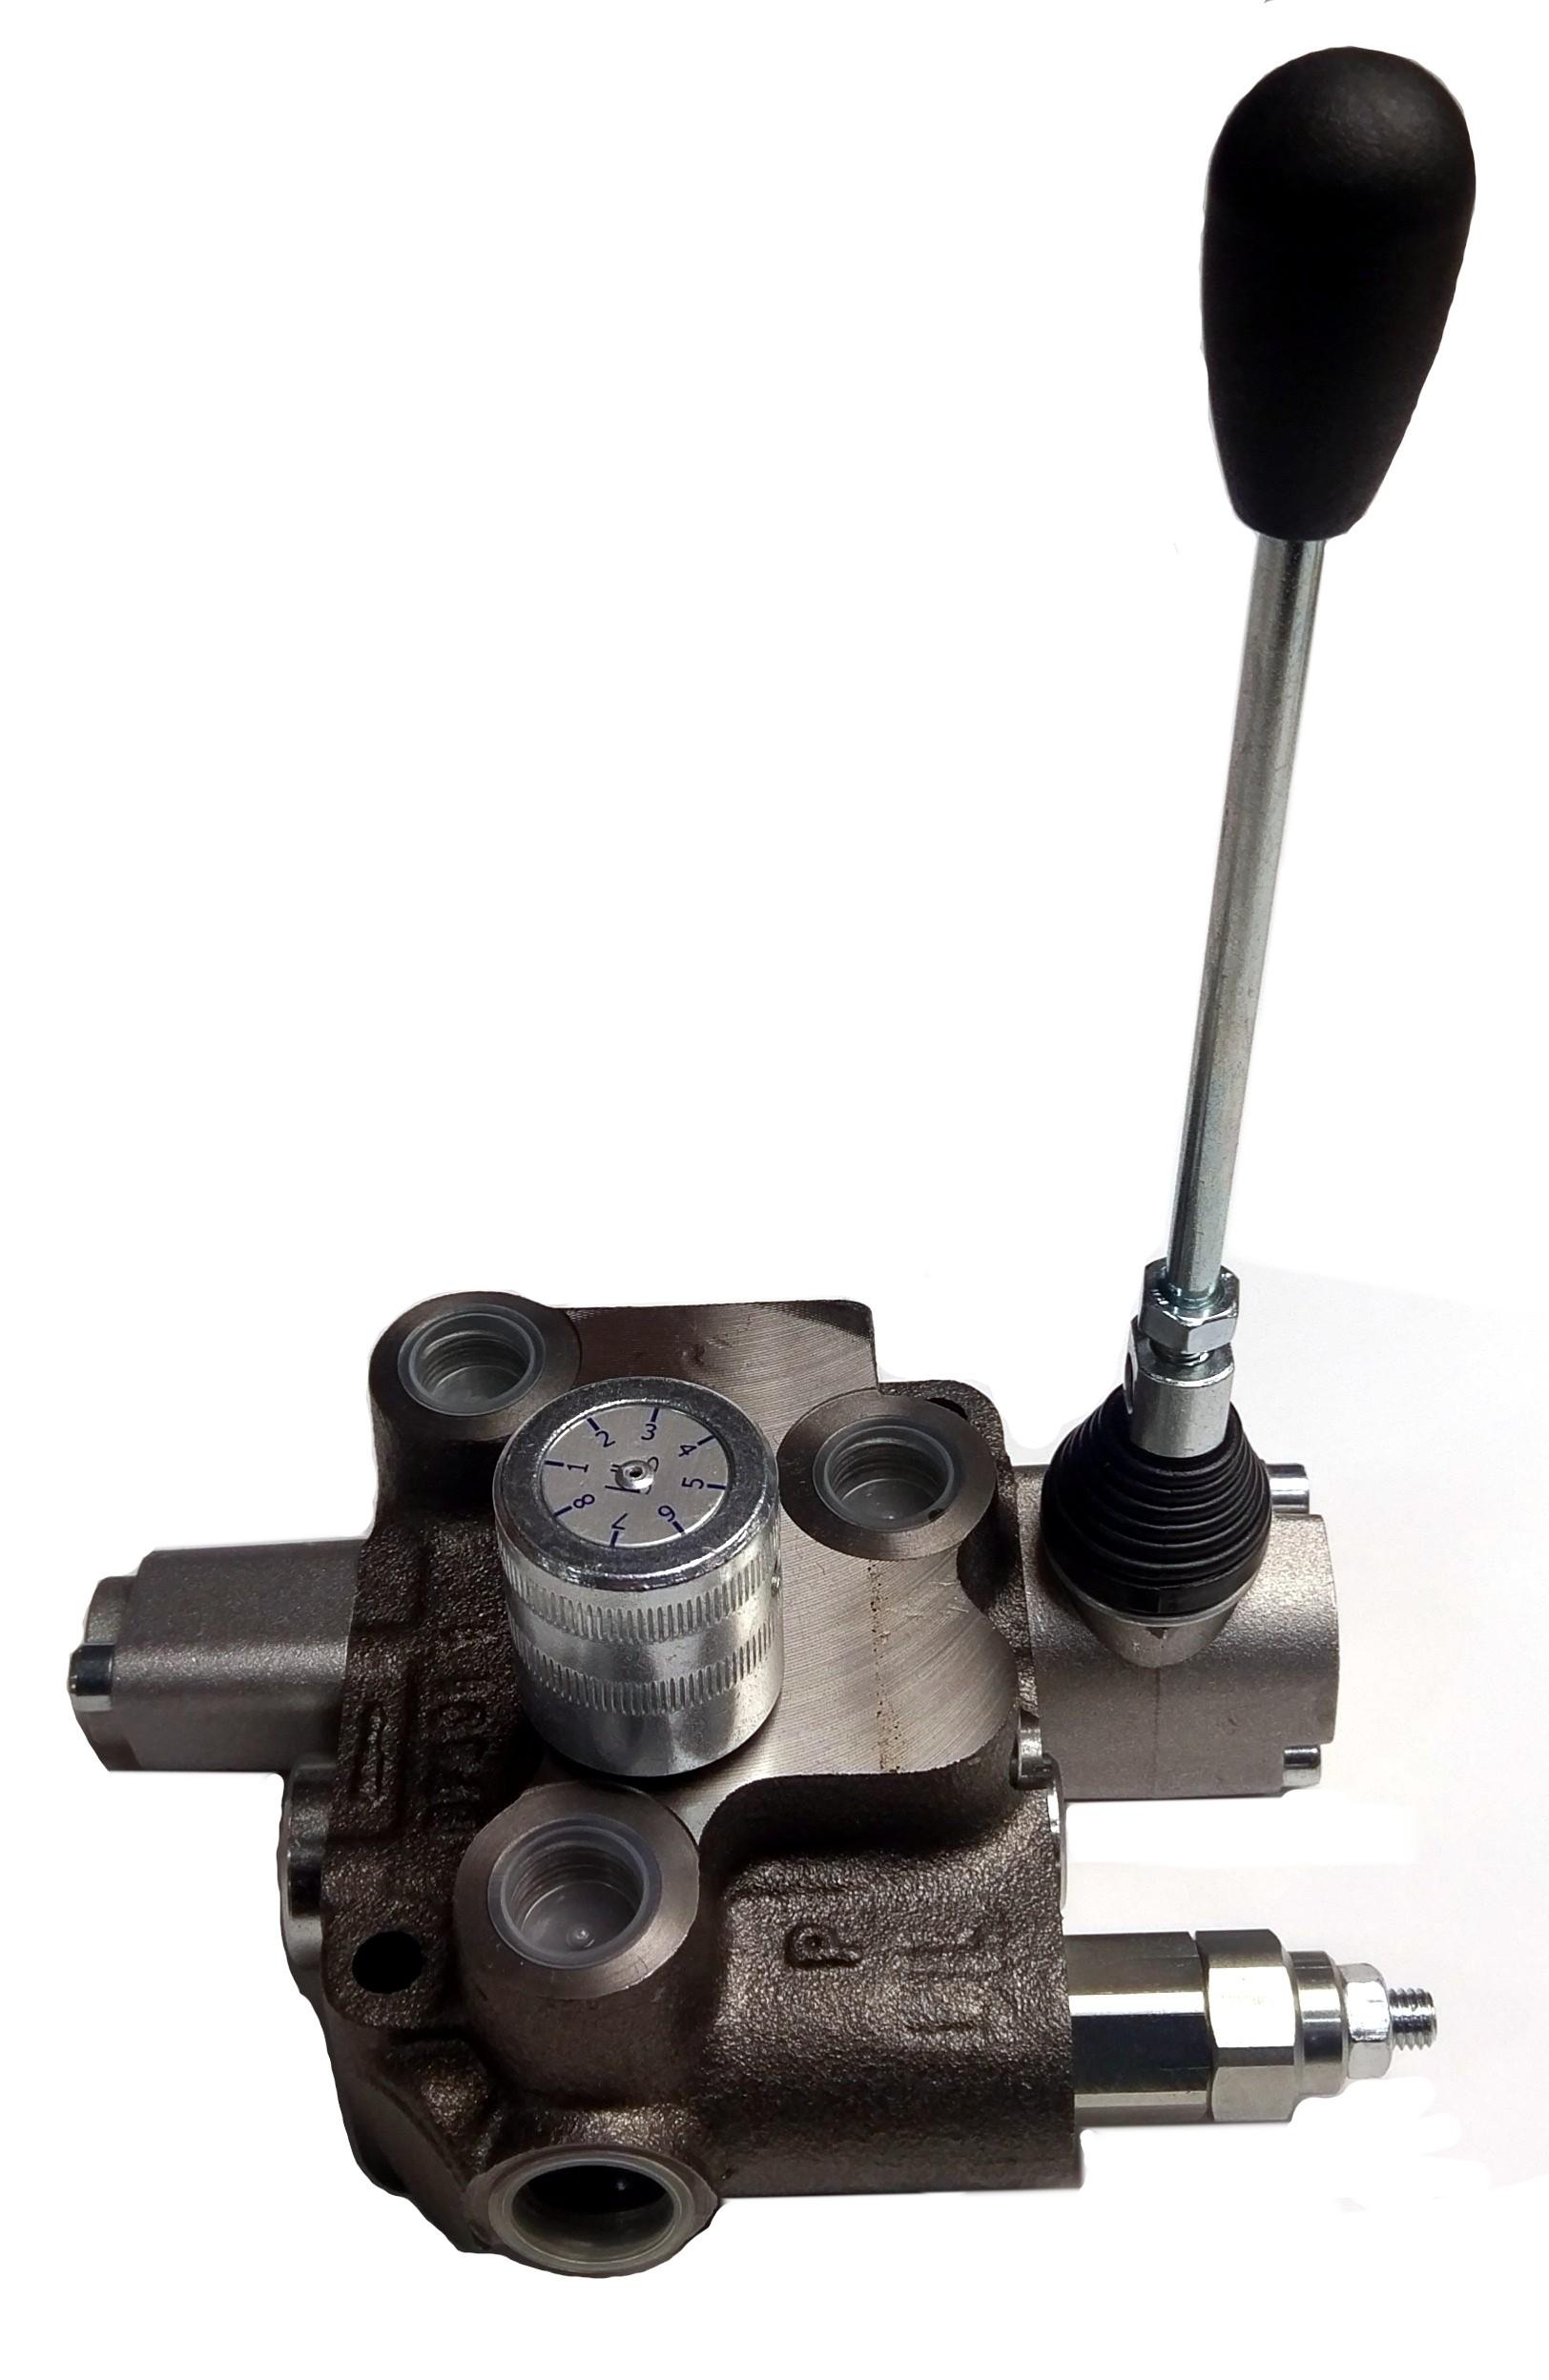 Blb monoblock valve motor spool 4way 3pos detented with for Hydraulic motor spool valve